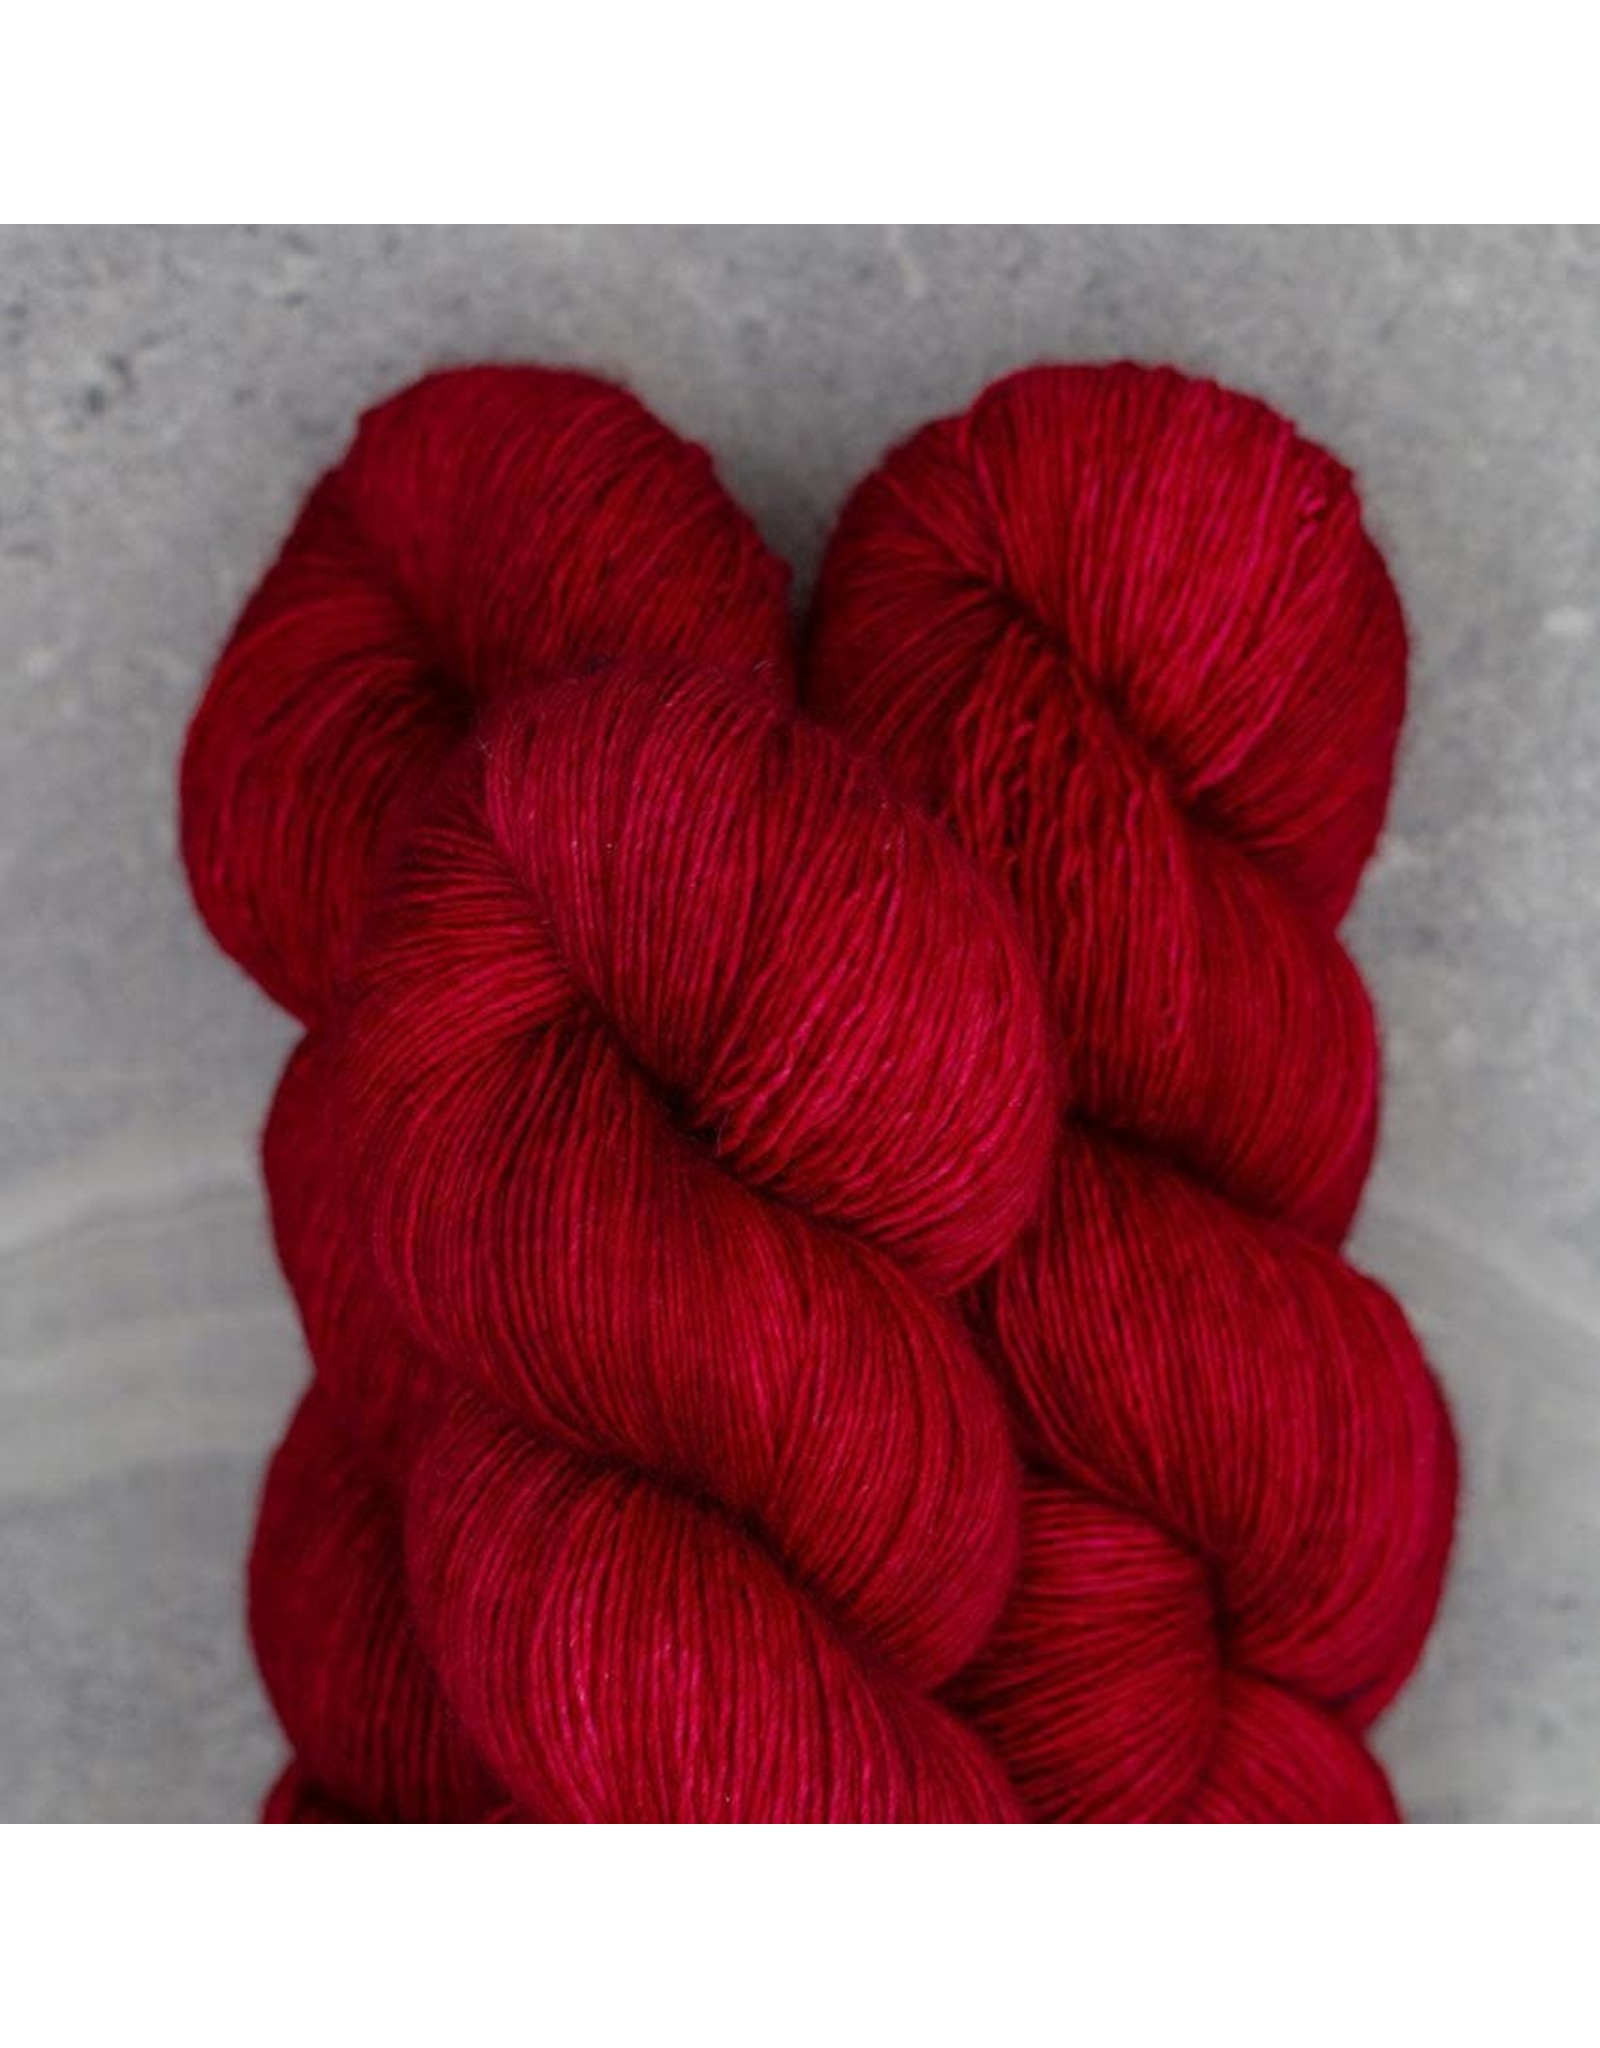 Blood Runs Cold - Unicorn Tails - Madelinetosh